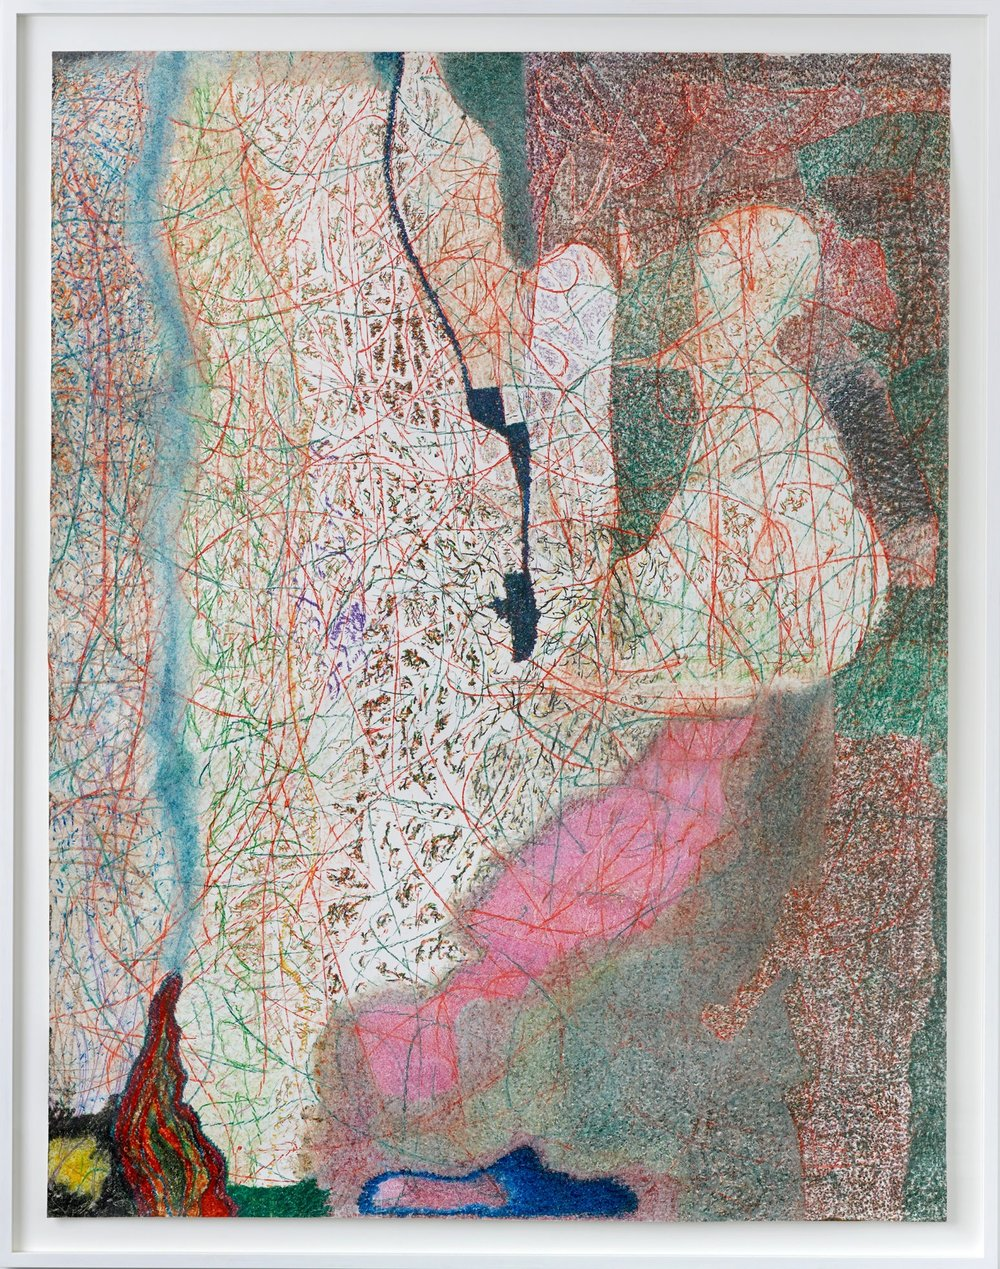 O.T. ( Come On Baby Light My Fire! ), 2017  Buntstift auf Papier, 205x160cm